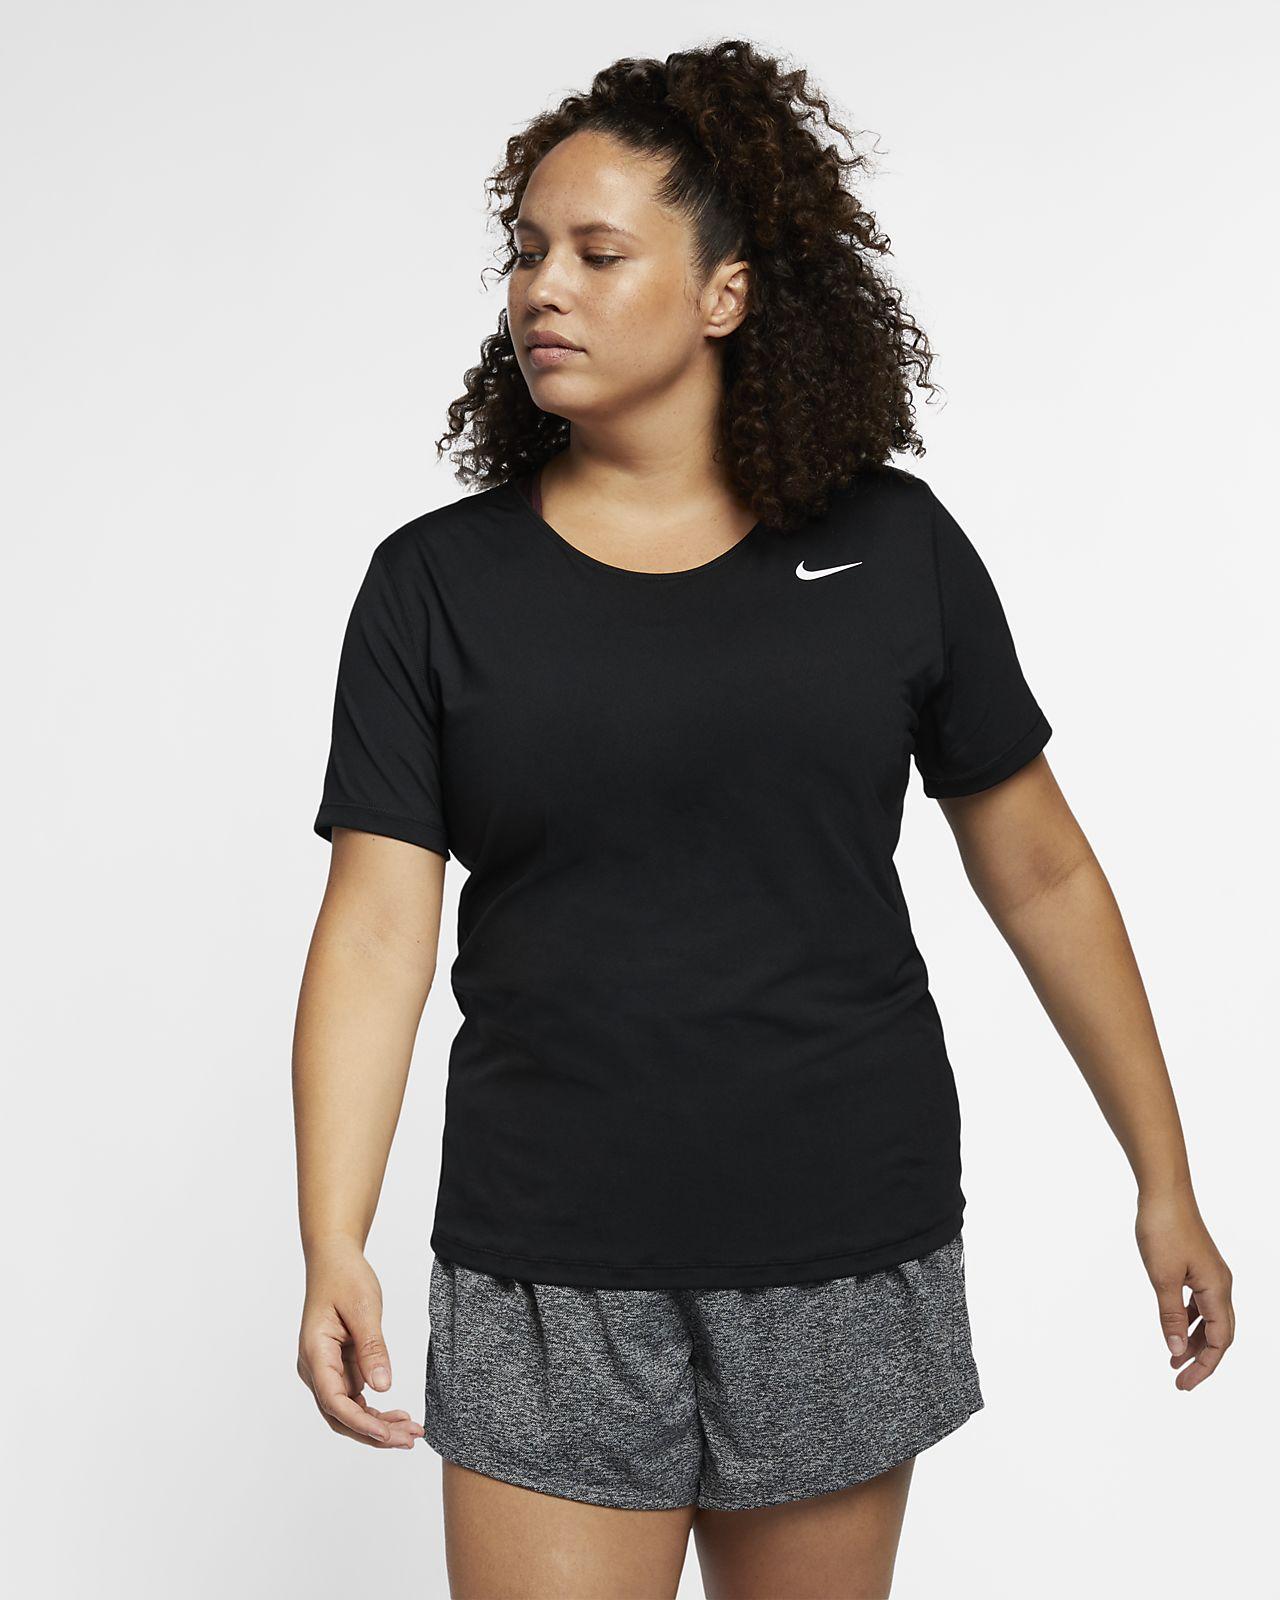 a9a51b7af66 Nike Pro (Plus Size) Women s Short-Sleeve Training Top. Nike.com NZ